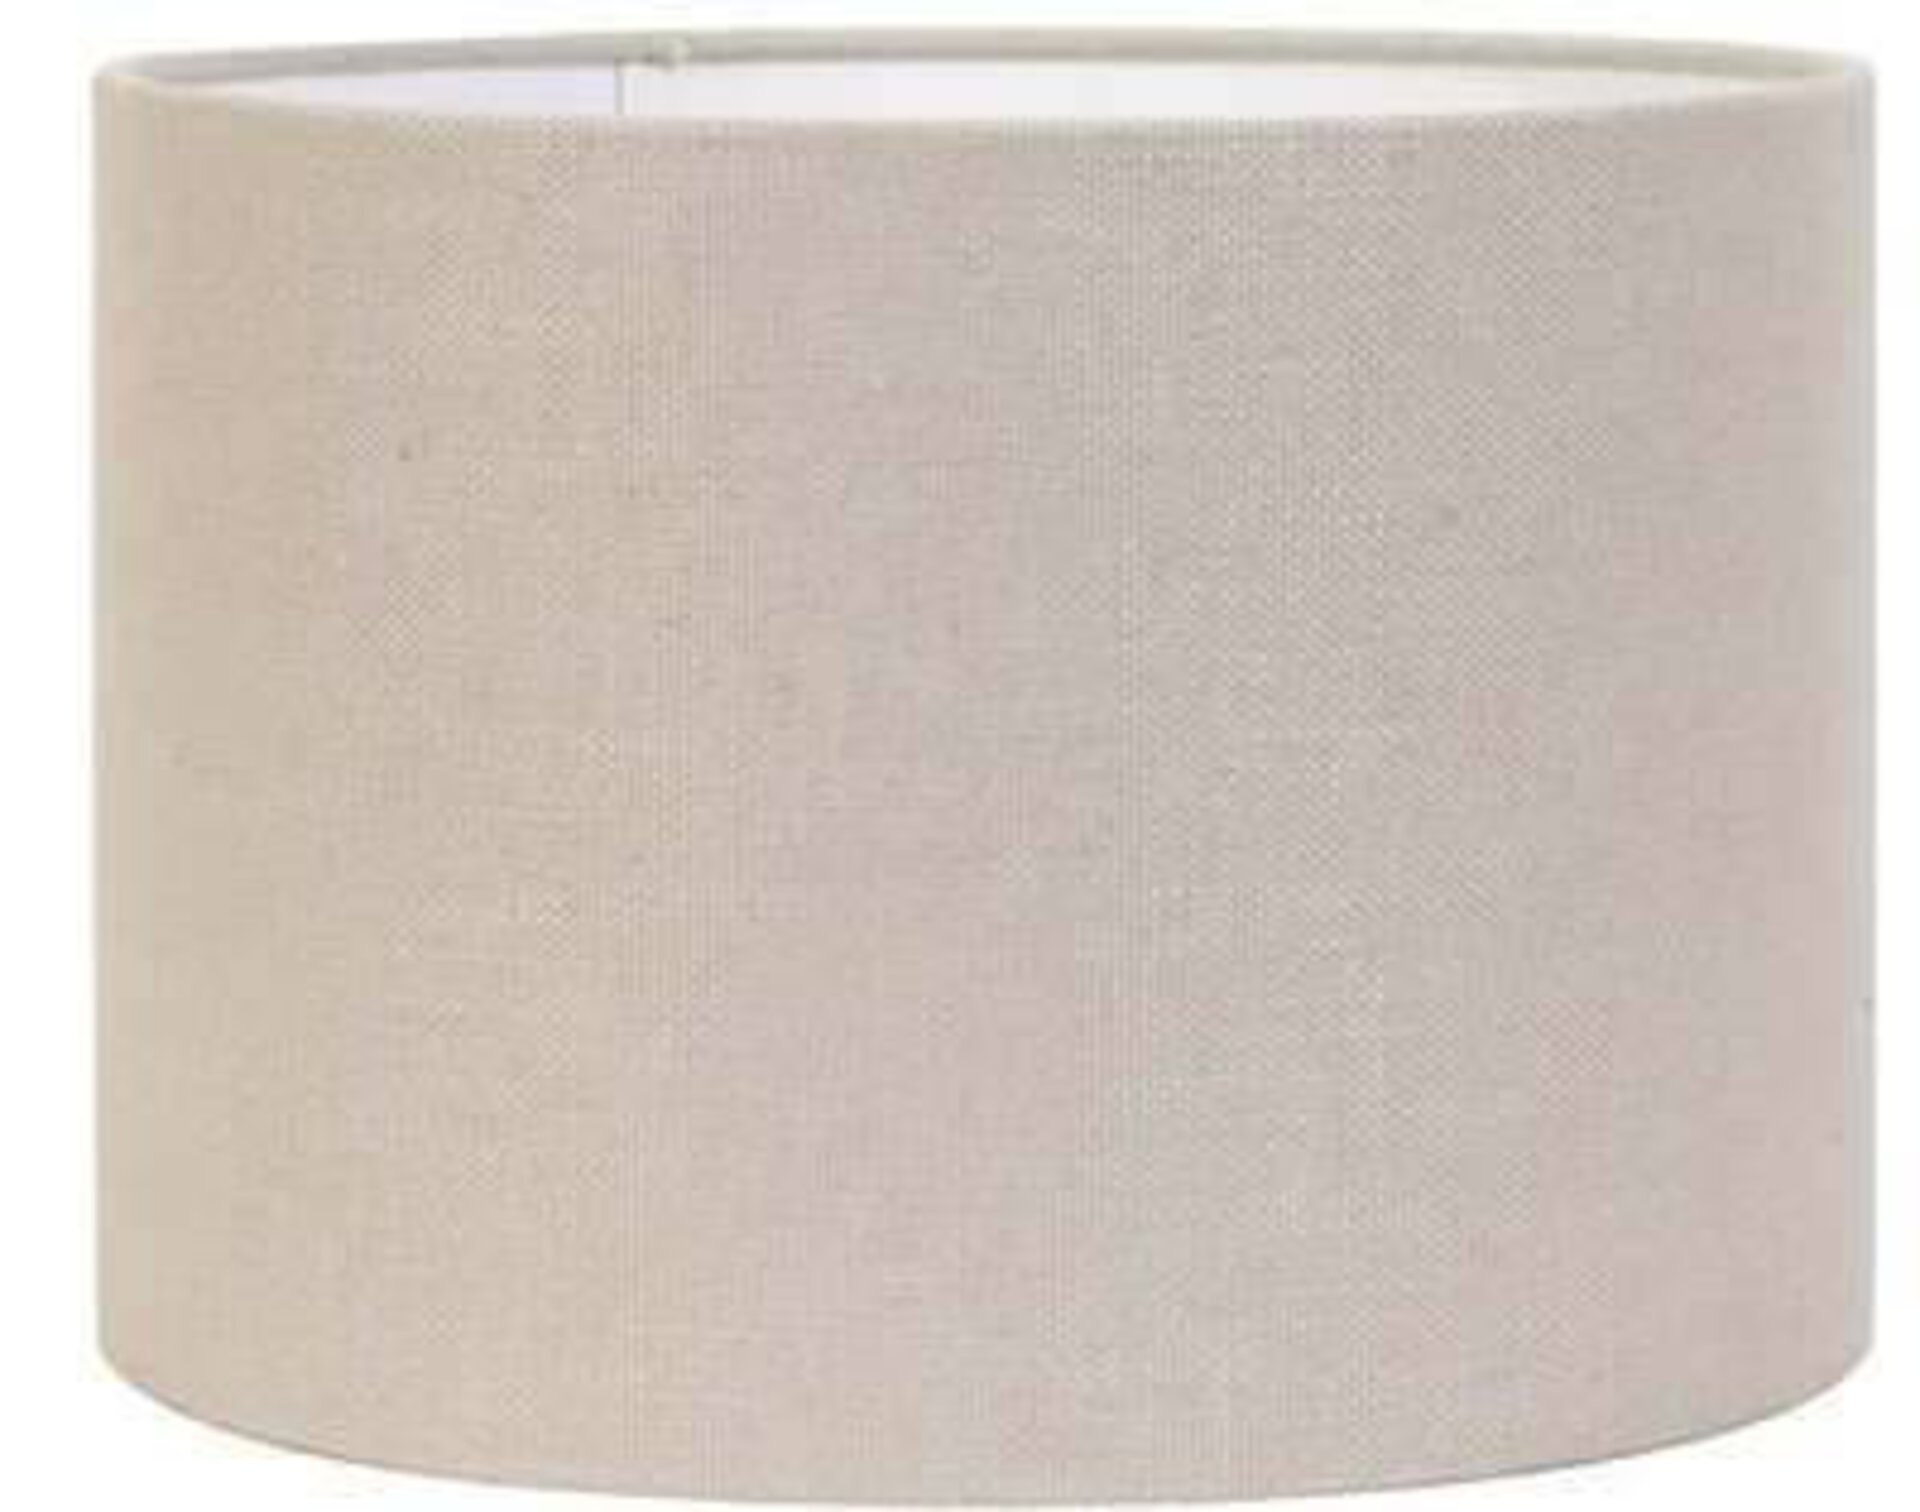 Zubehör LIVIGNO Light & Living Textil grau 25 x 18 x 25 cm